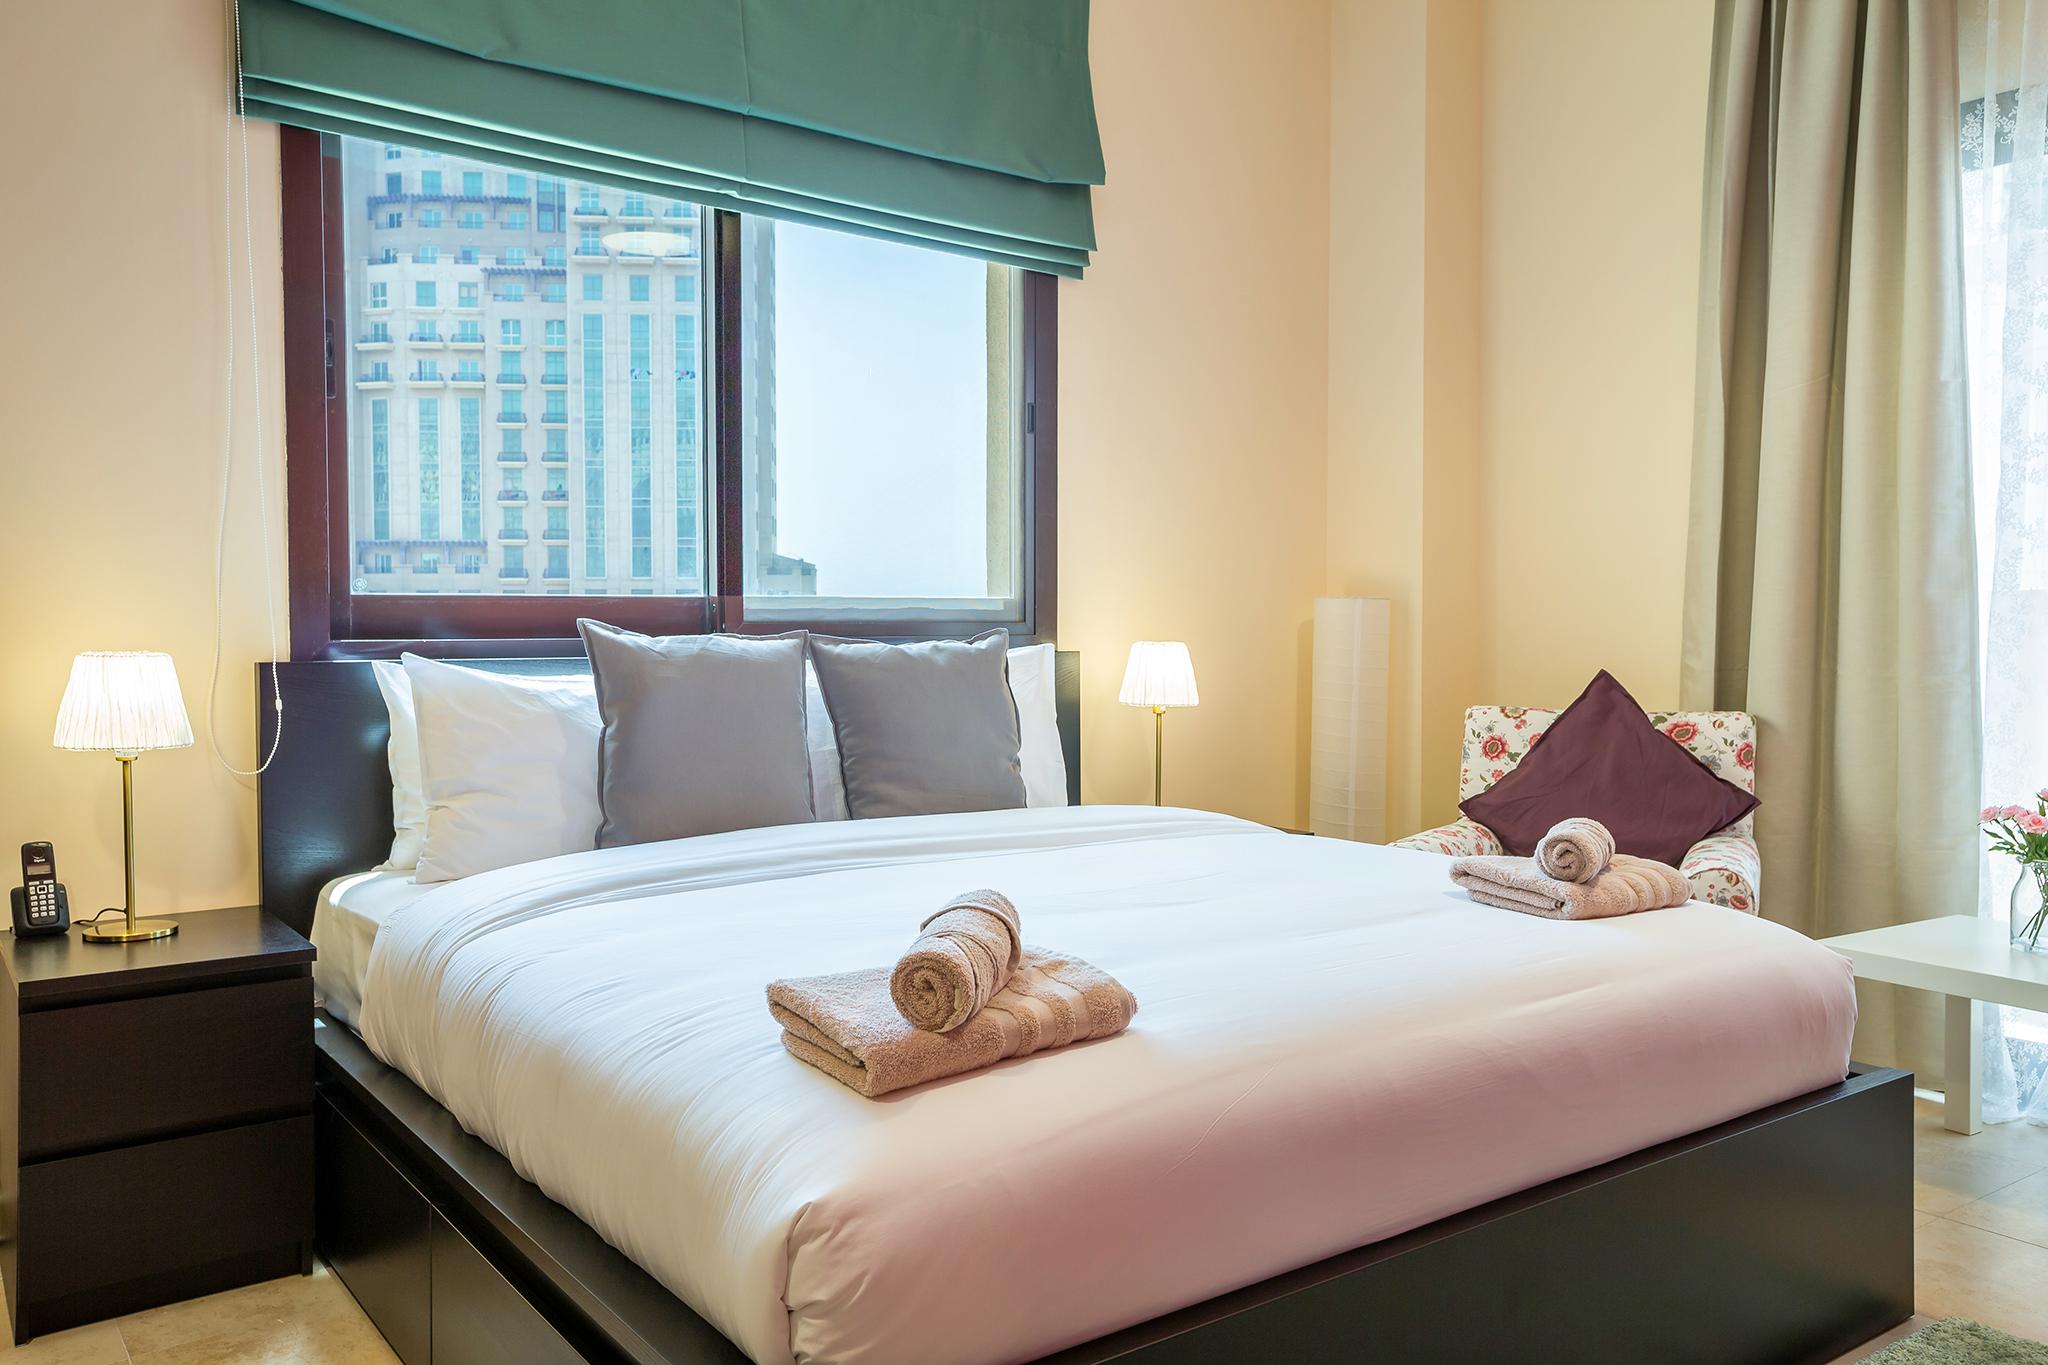 Comfy bed, guaranteed for a good night's sleep